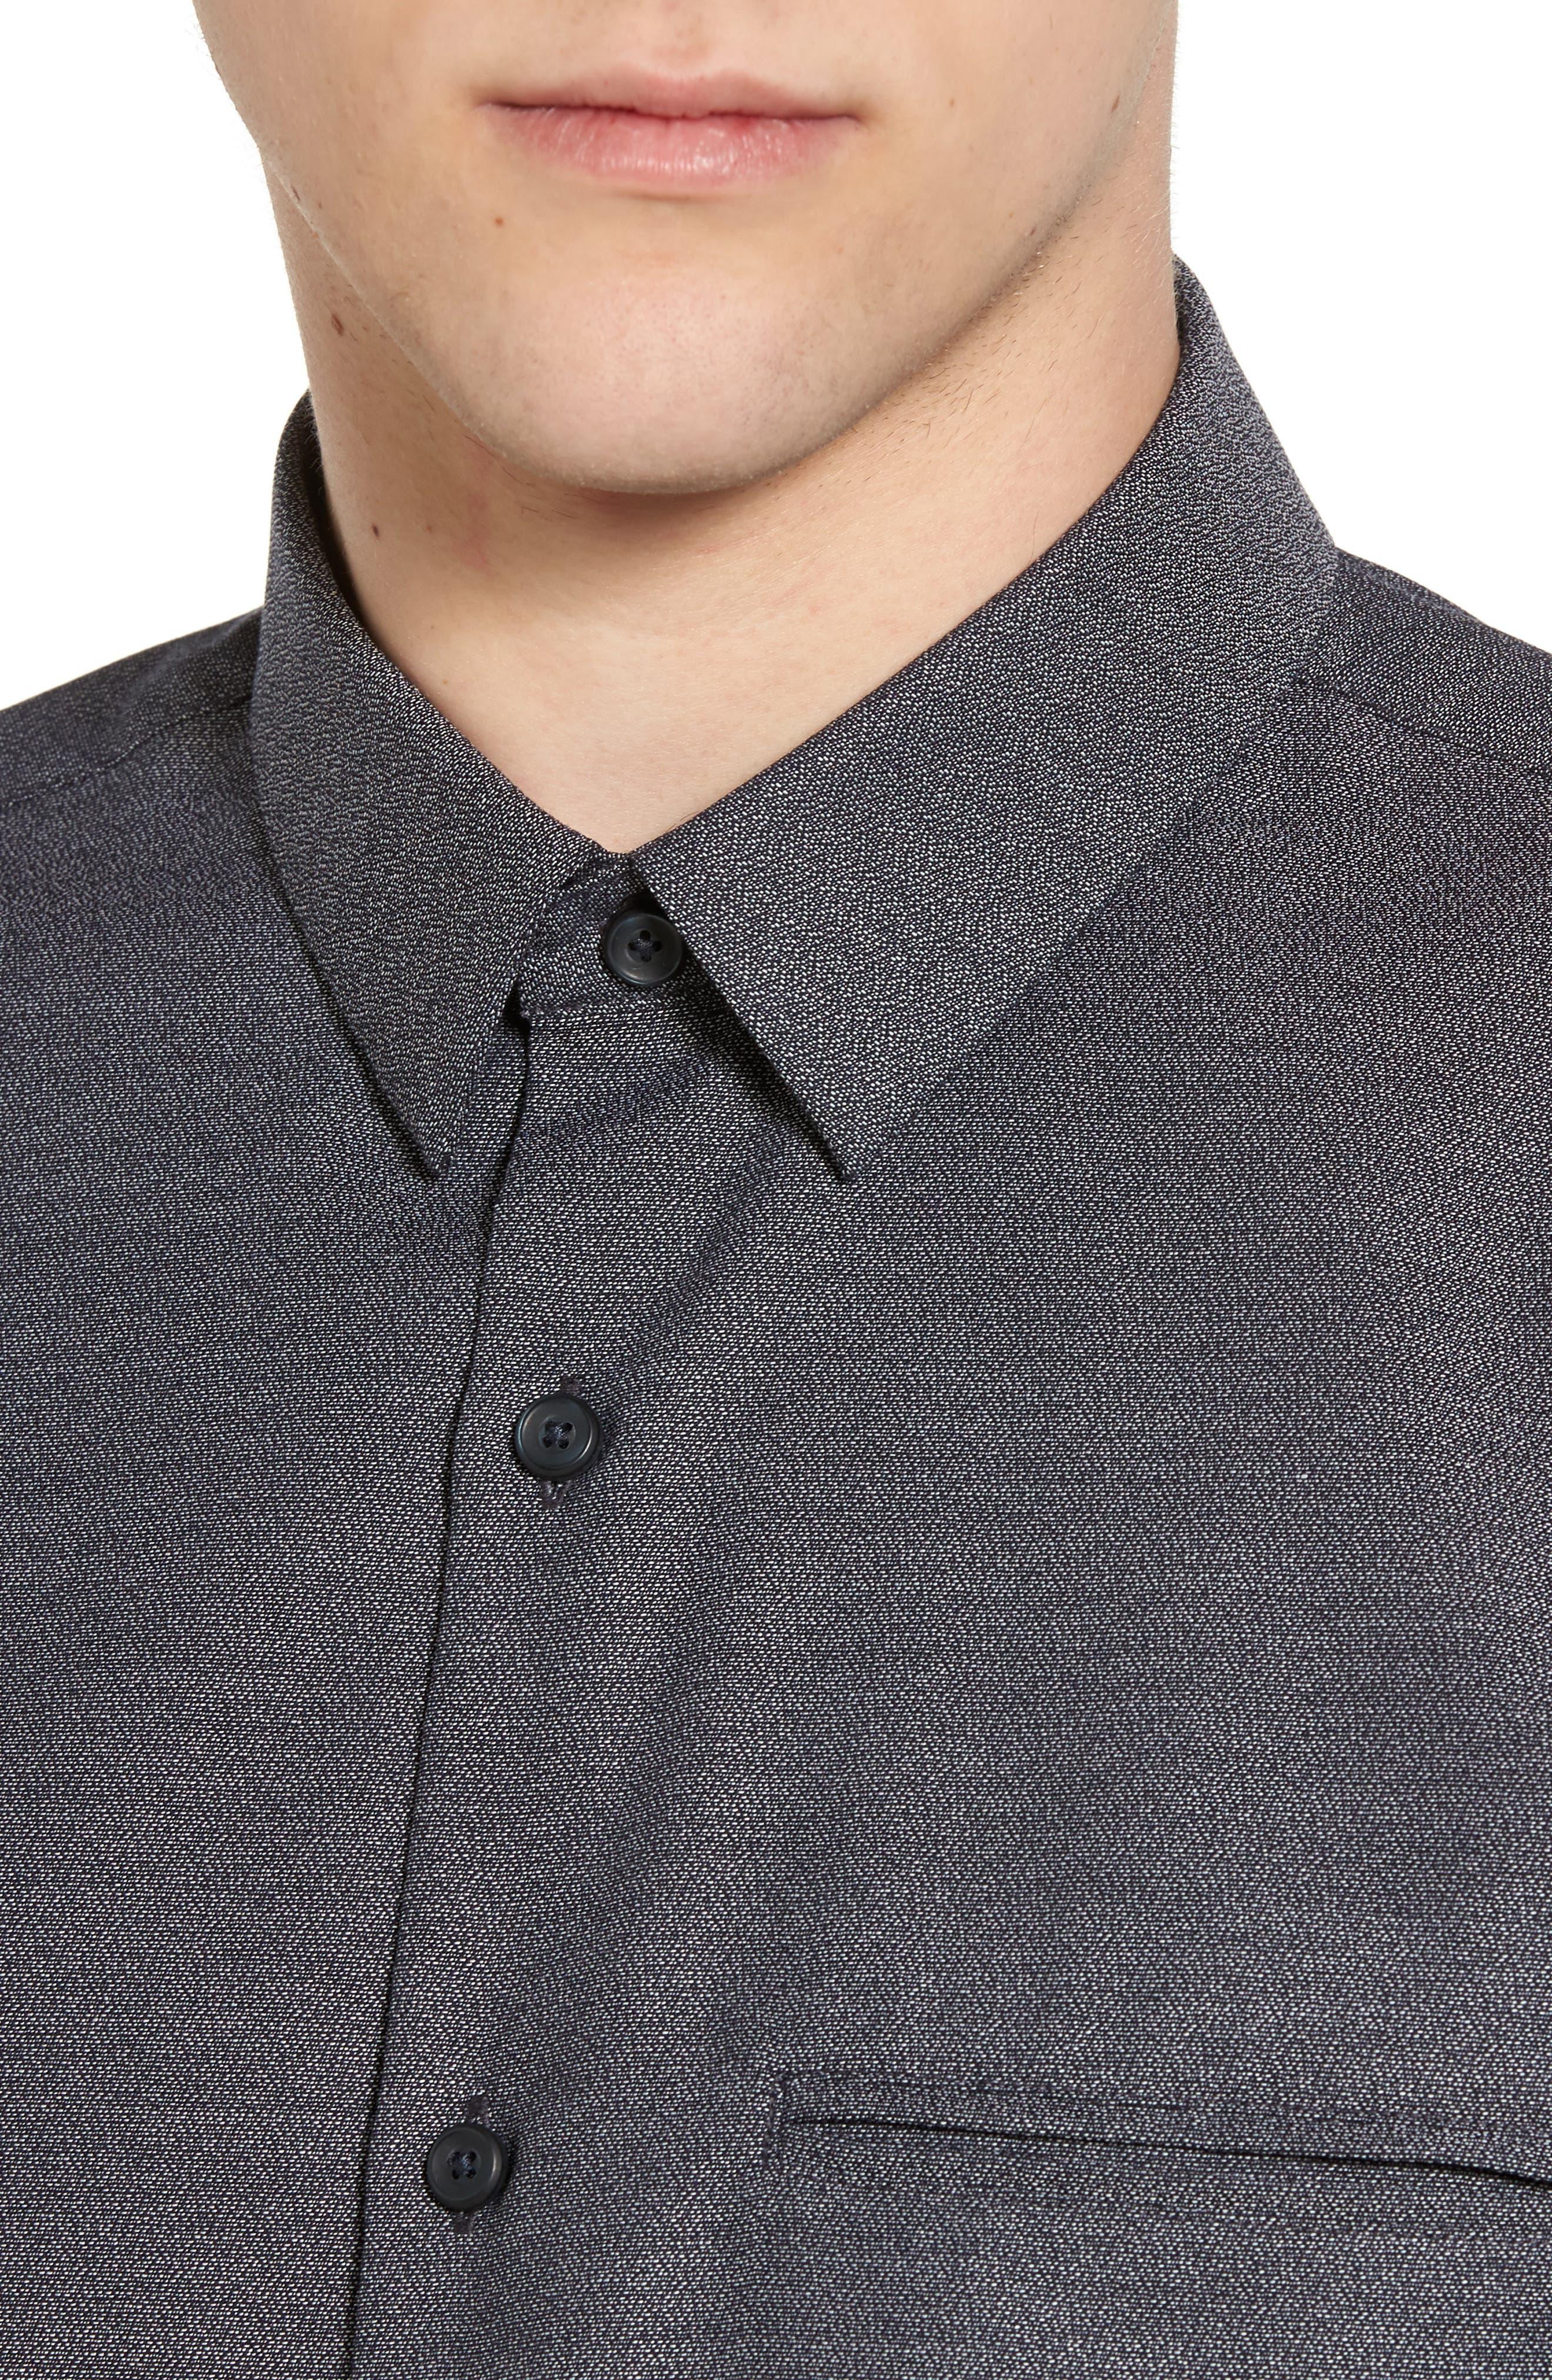 Trim Fit Jaspé Short Sleeve Sport Shirt,                             Alternate thumbnail 2, color,                             Navy Night Jacquard